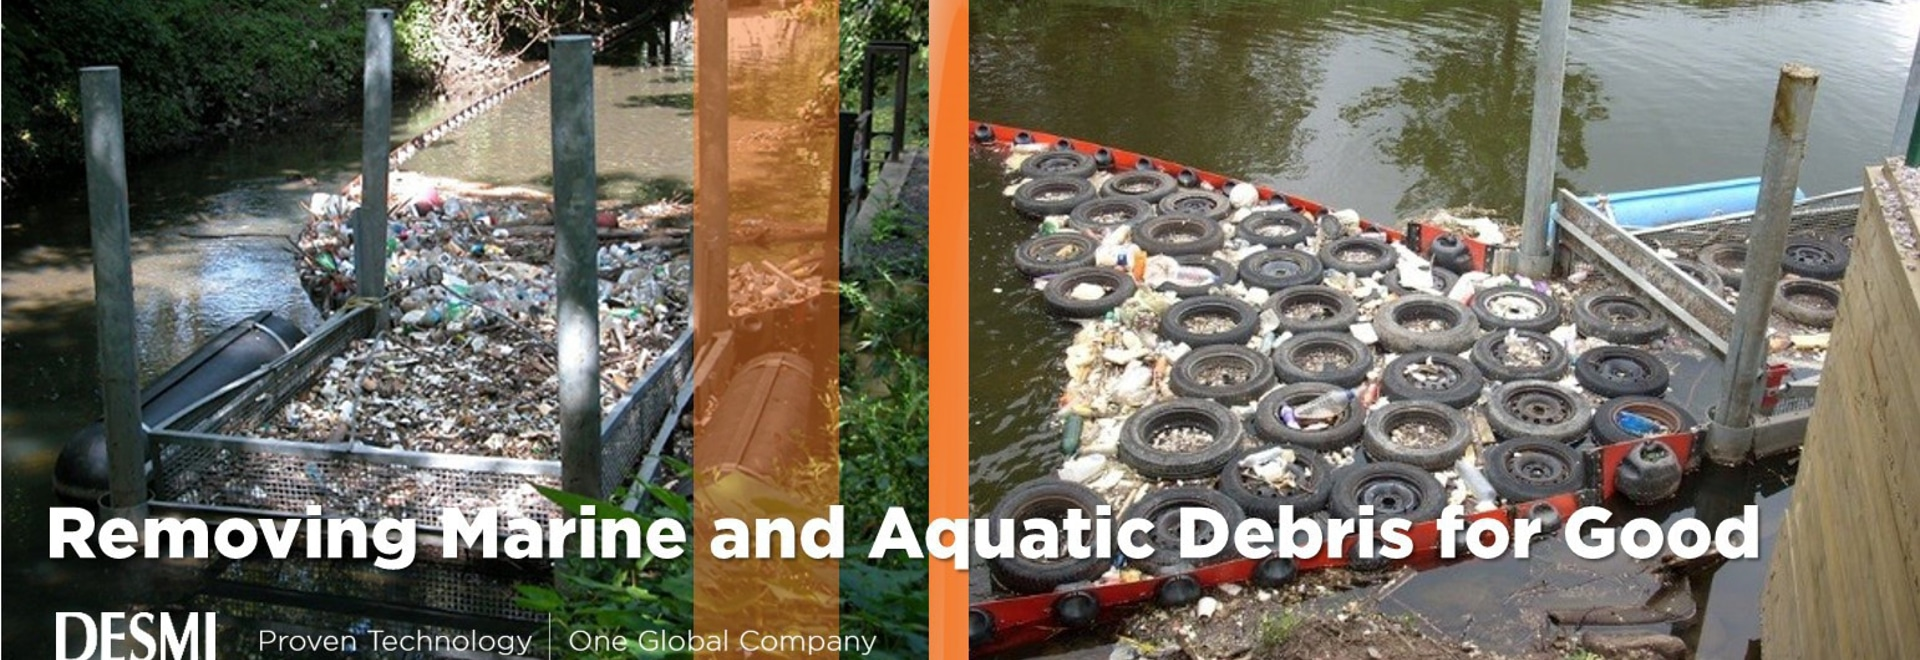 Removing Marine and Aquatic Debris for Good